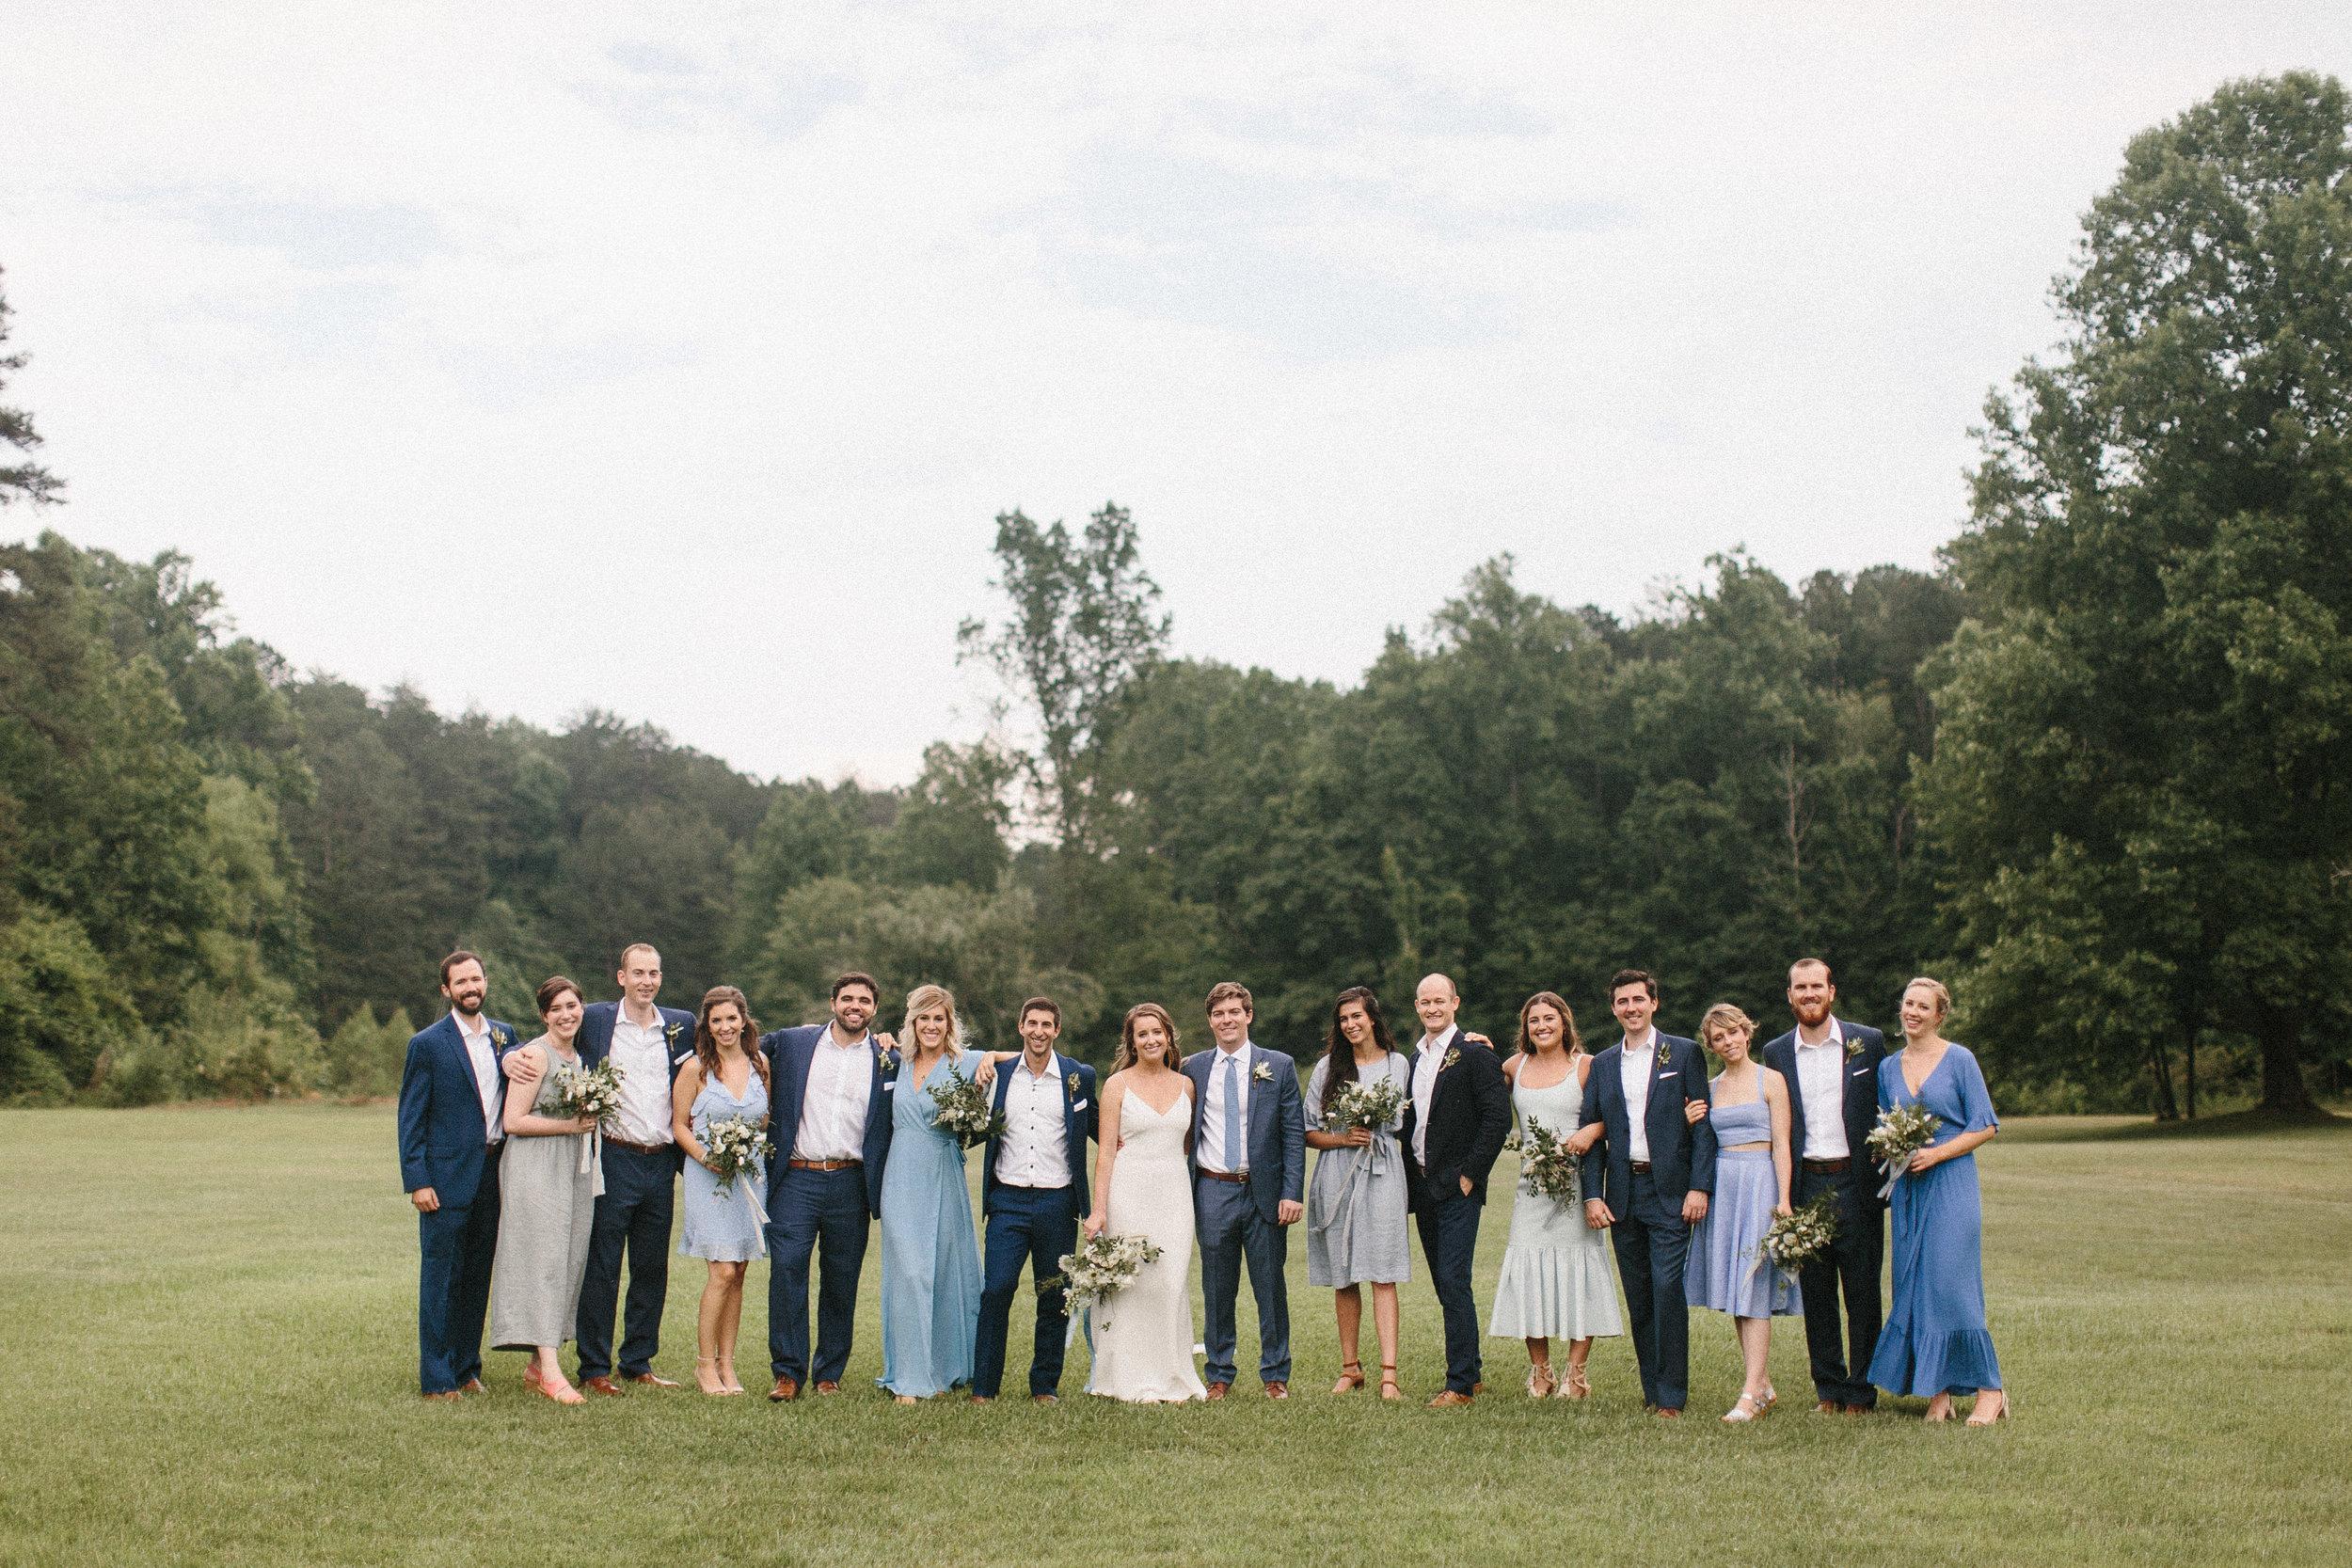 glen_ella_meadow_creekside_atlanta_wedding_photographers_1572.jpg